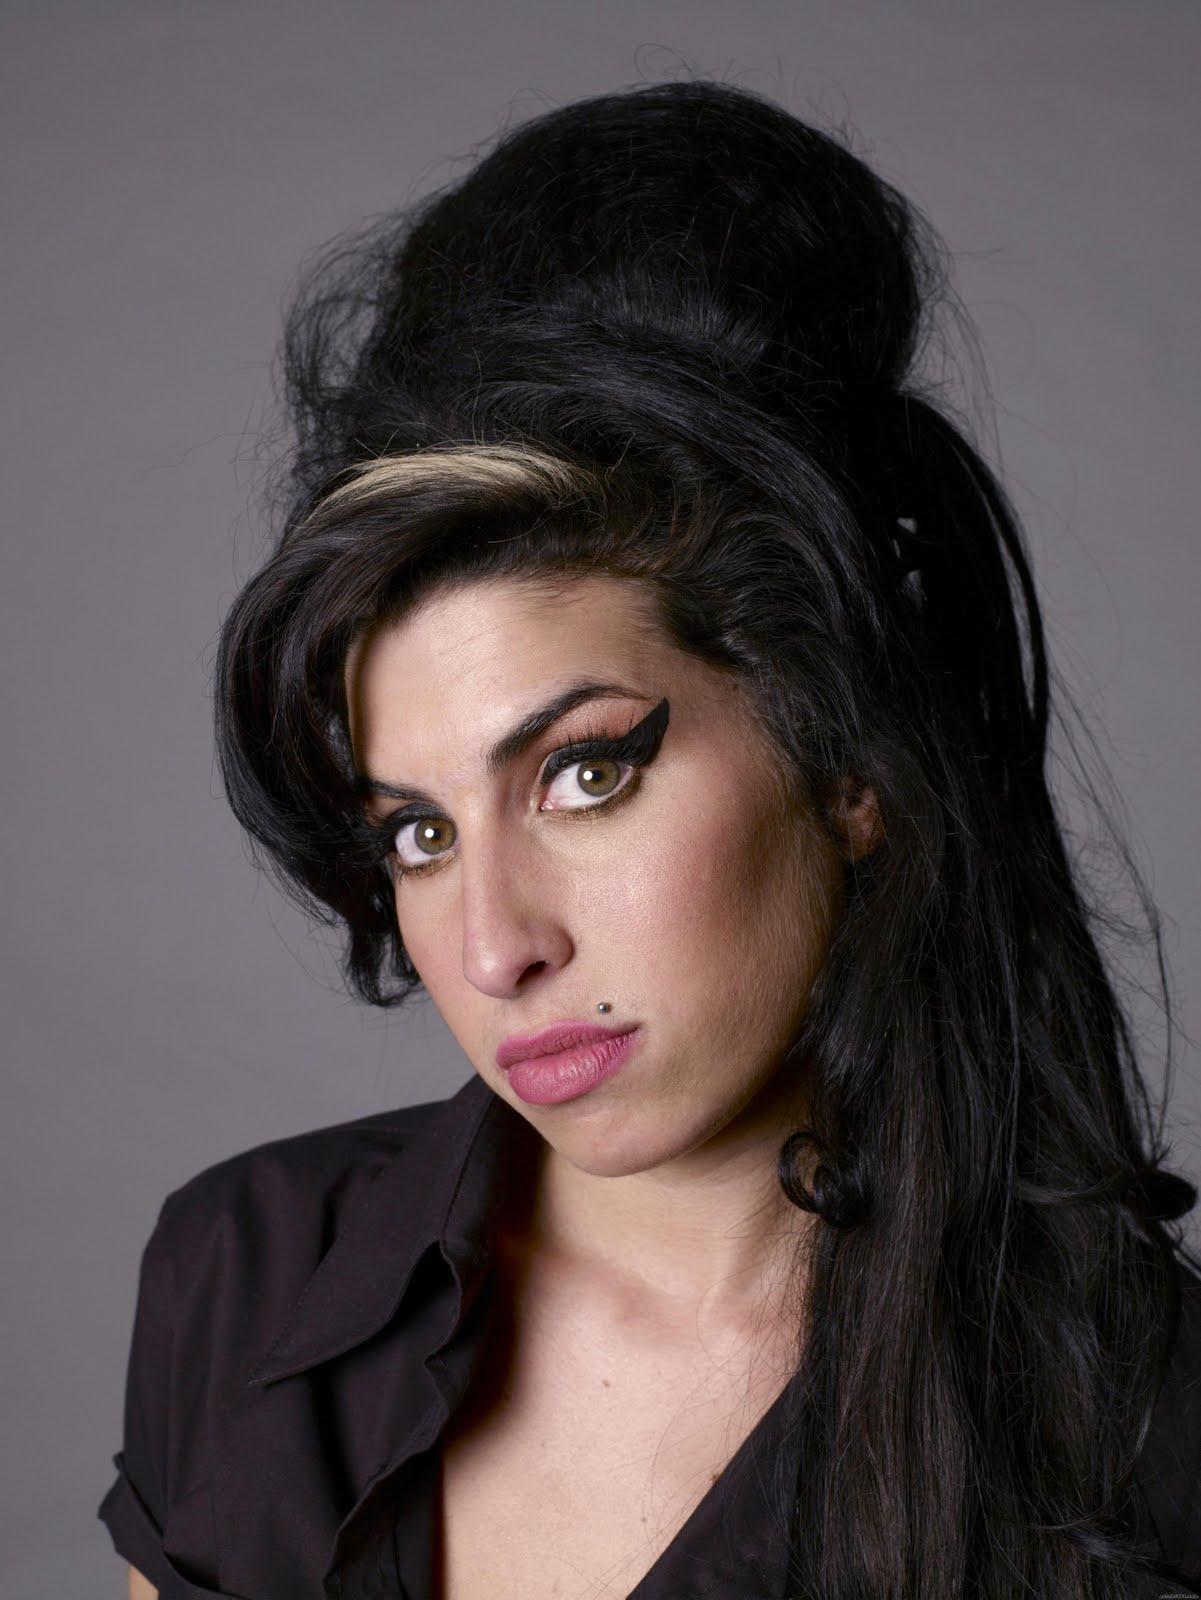 https://3.bp.blogspot.com/-qG7uv1W2JSc/Tir7lMGoD7I/AAAAAAAAamw/9f9uI5llRhE/s1600/Amy+Winehouse+wallpaper+%25284%2529.jpg